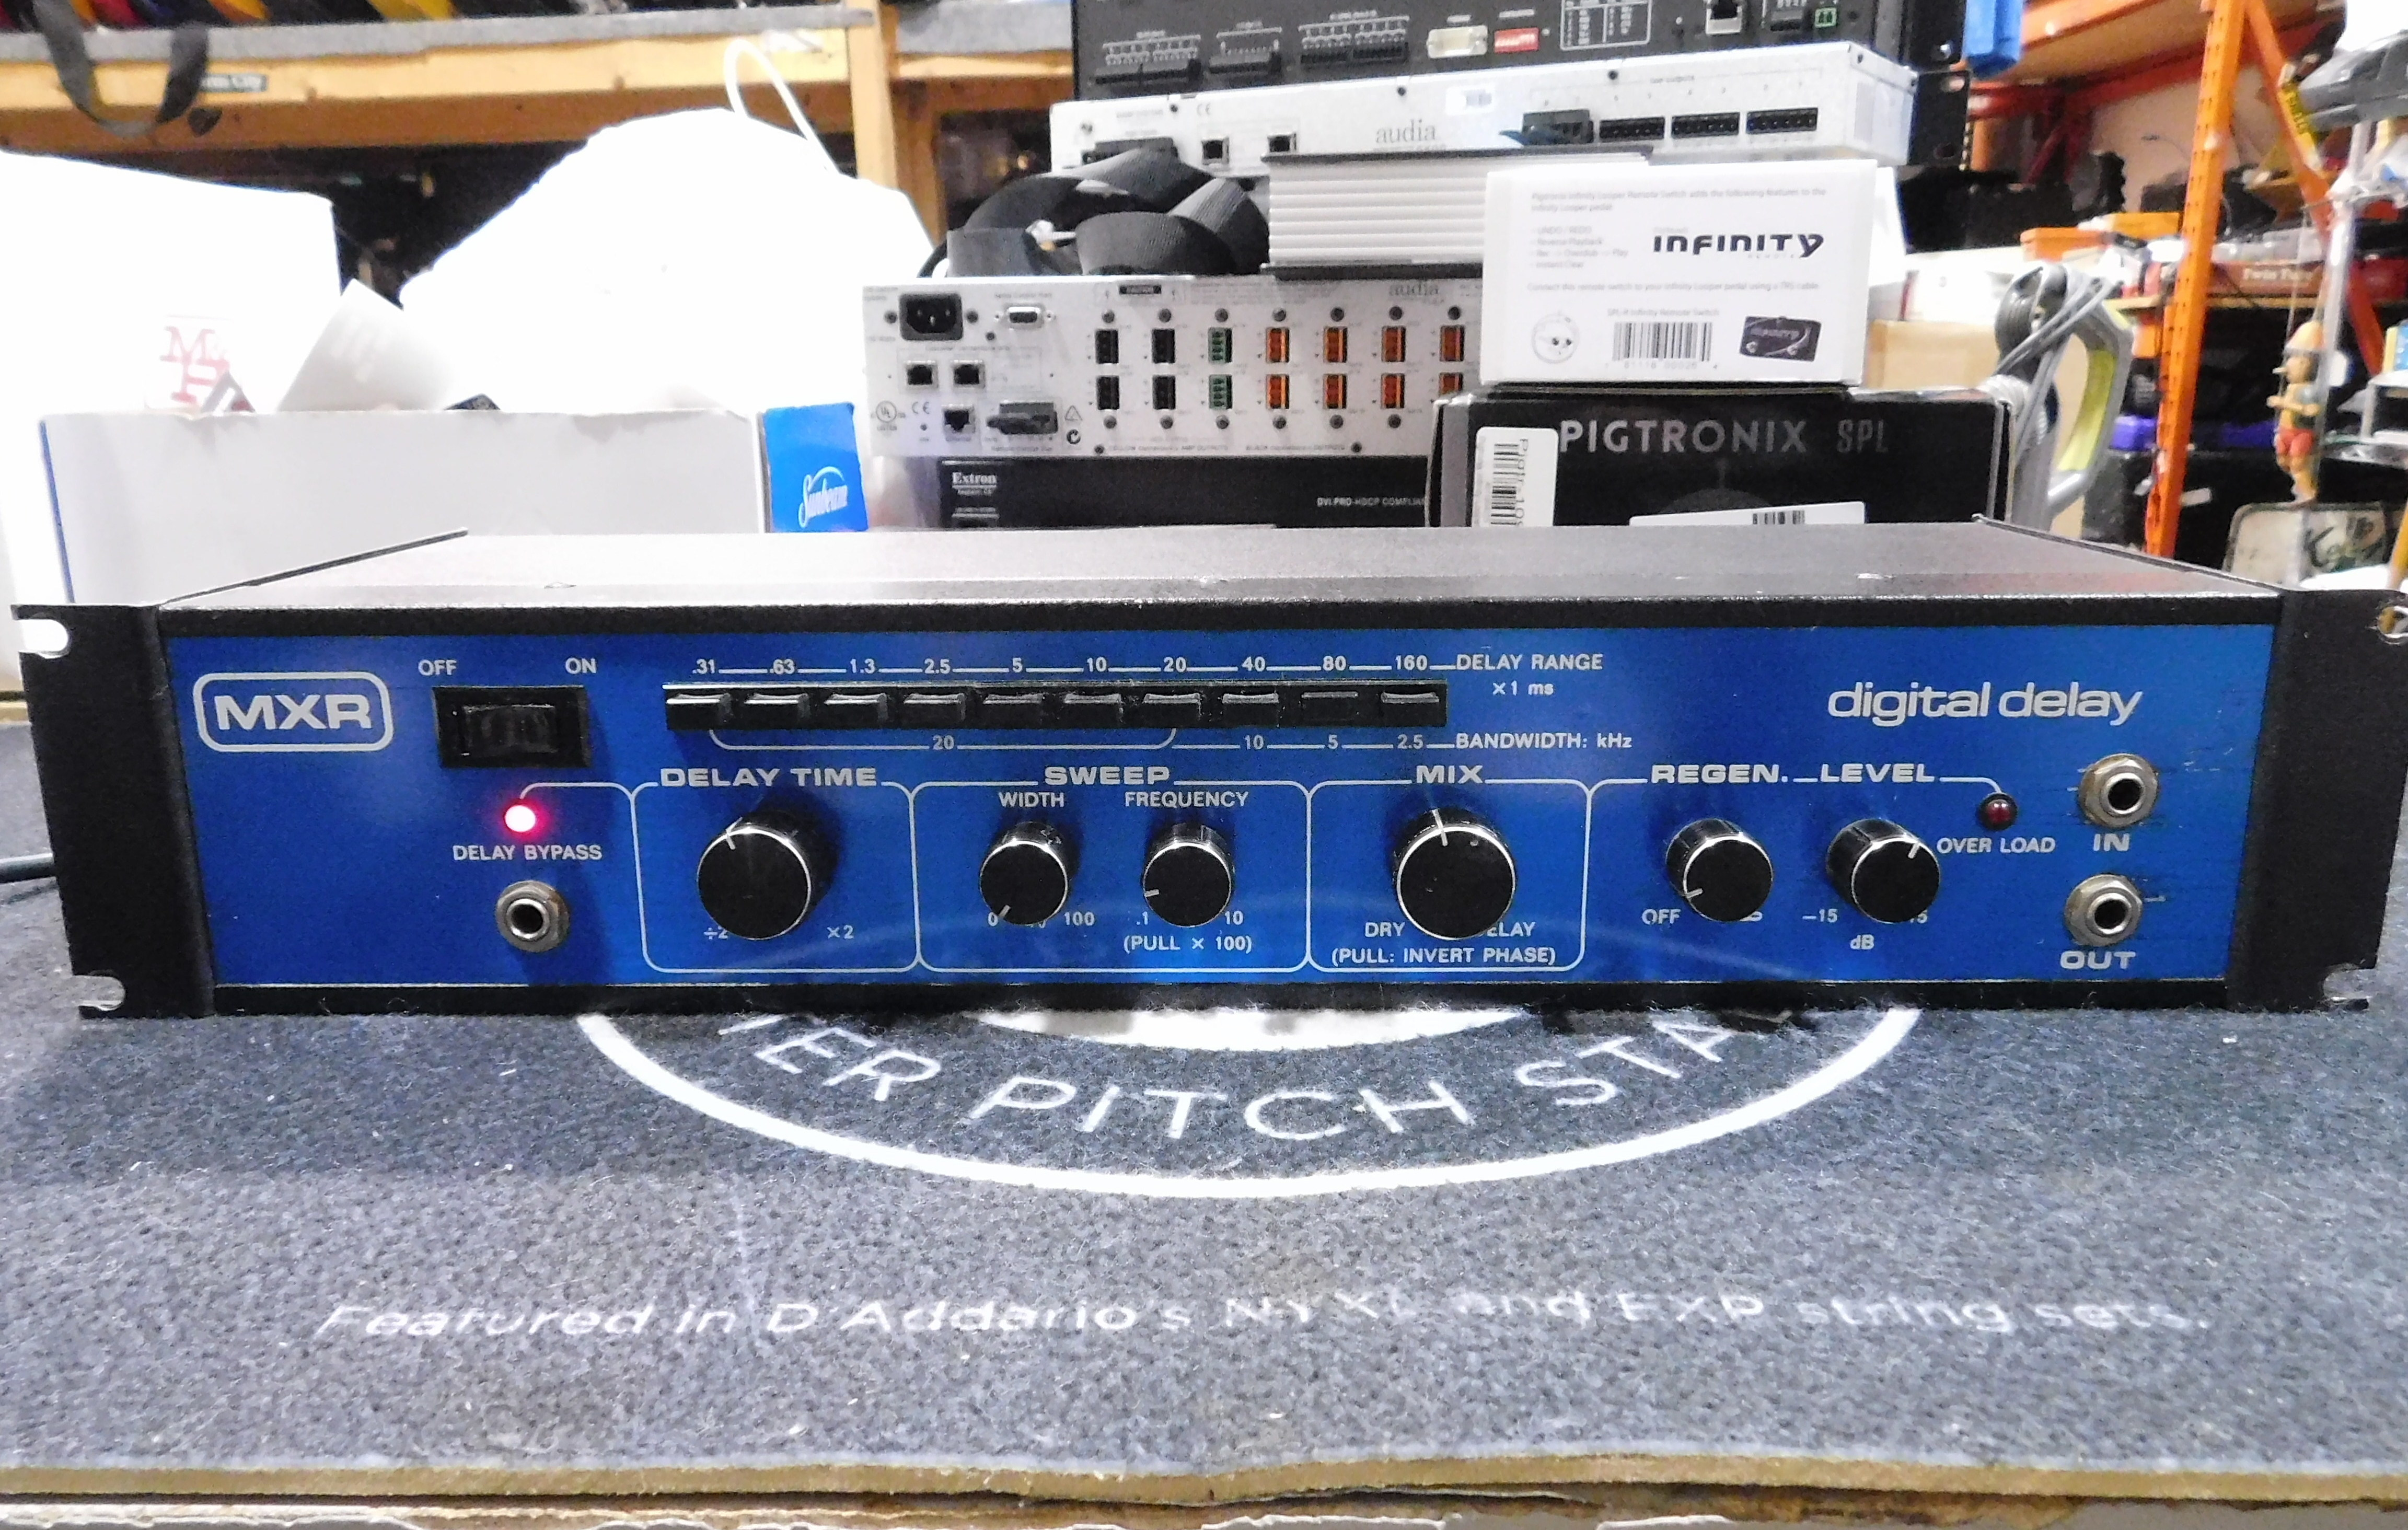 MXR DIGITAL DELAY Blue Face Vintage Rackmount Effects Unit